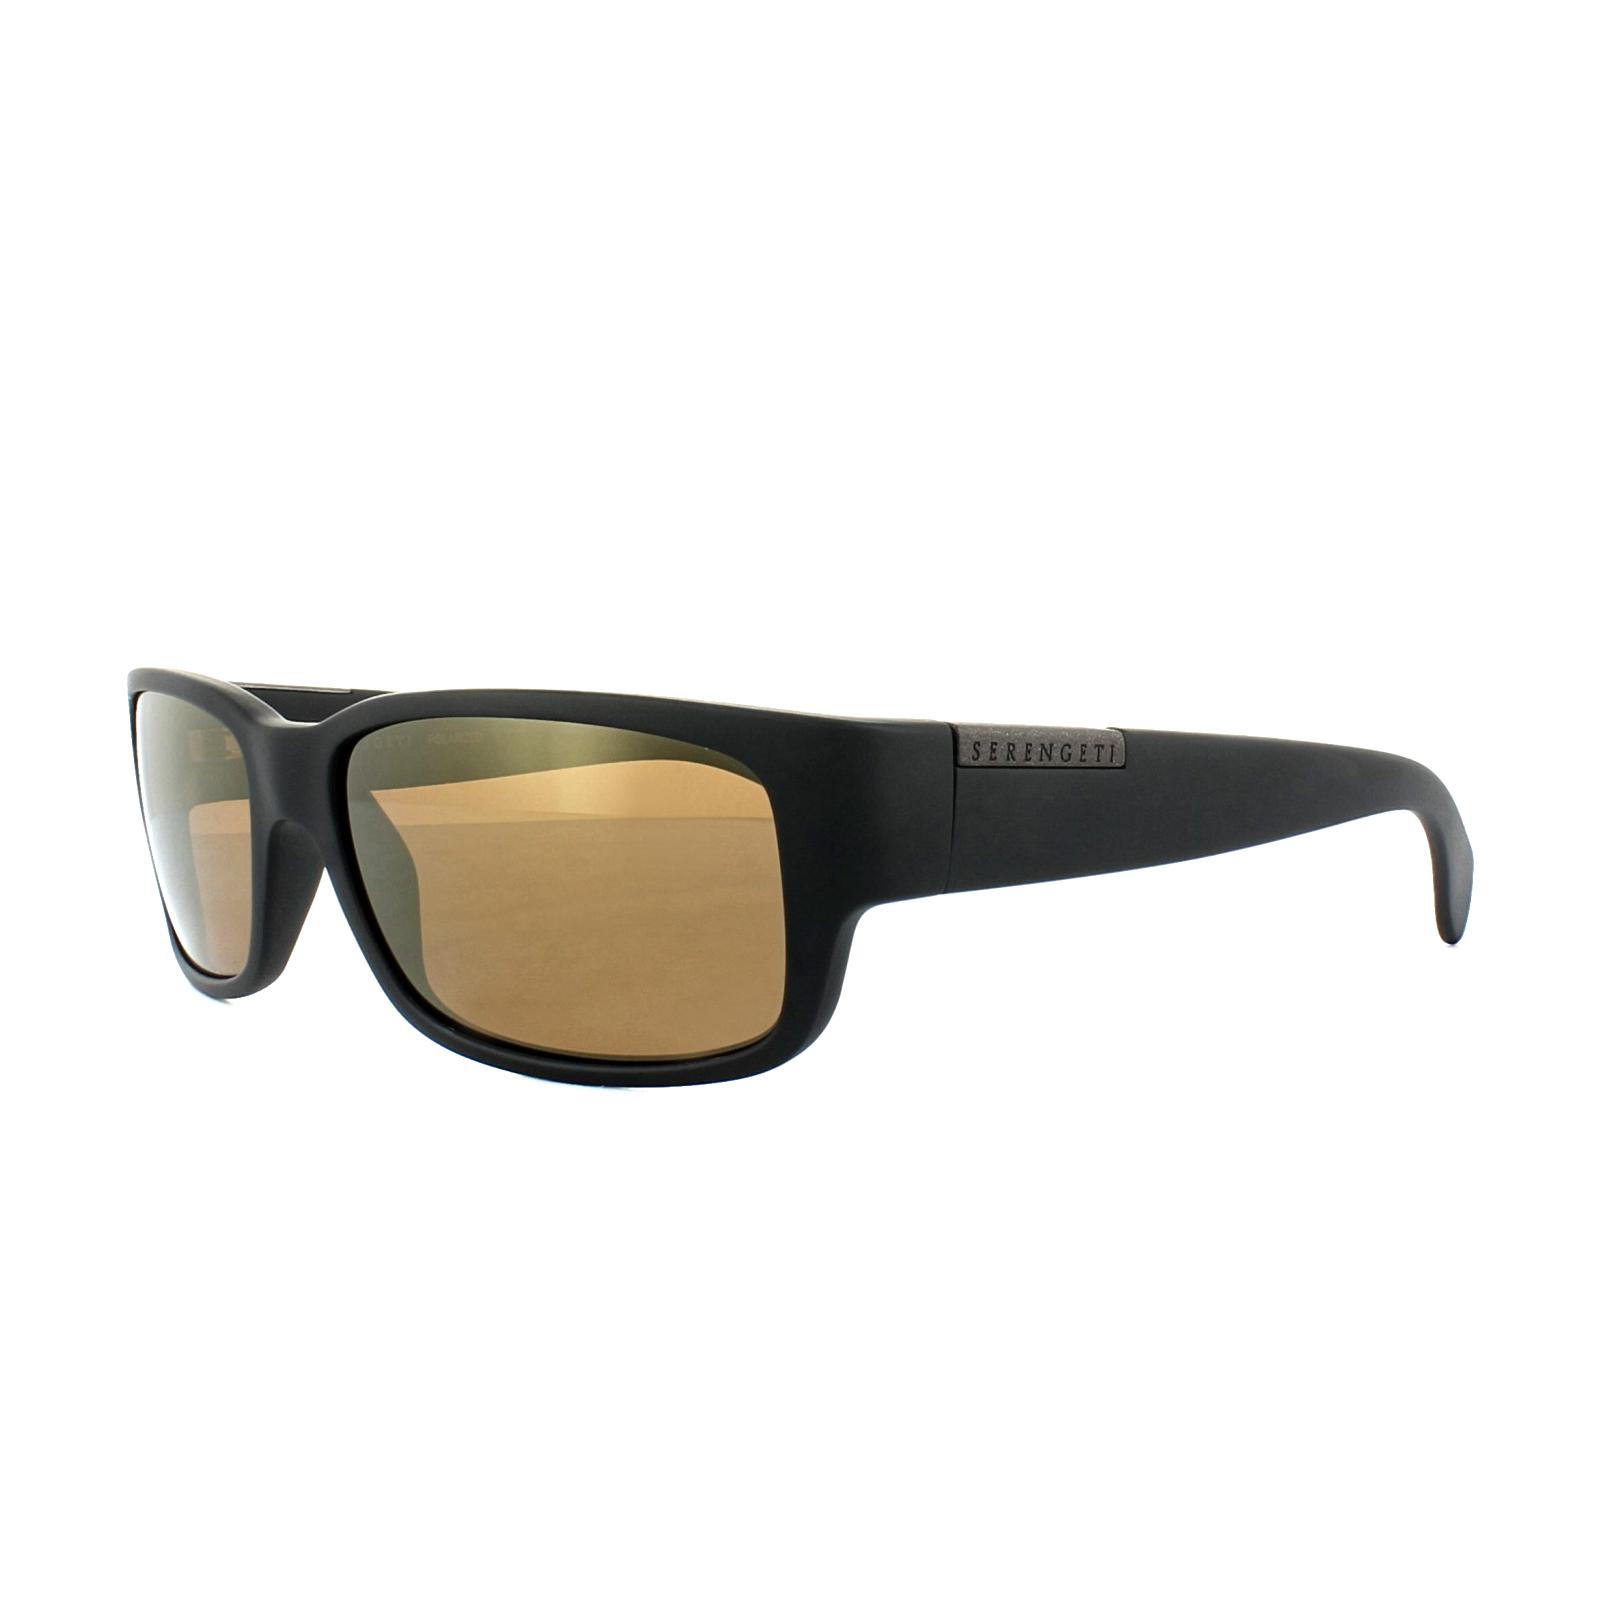 7f53fcbbe5 Sentinel Serengeti Sunglasses Merano 8437 Satin Black Drivers Gold Polarized